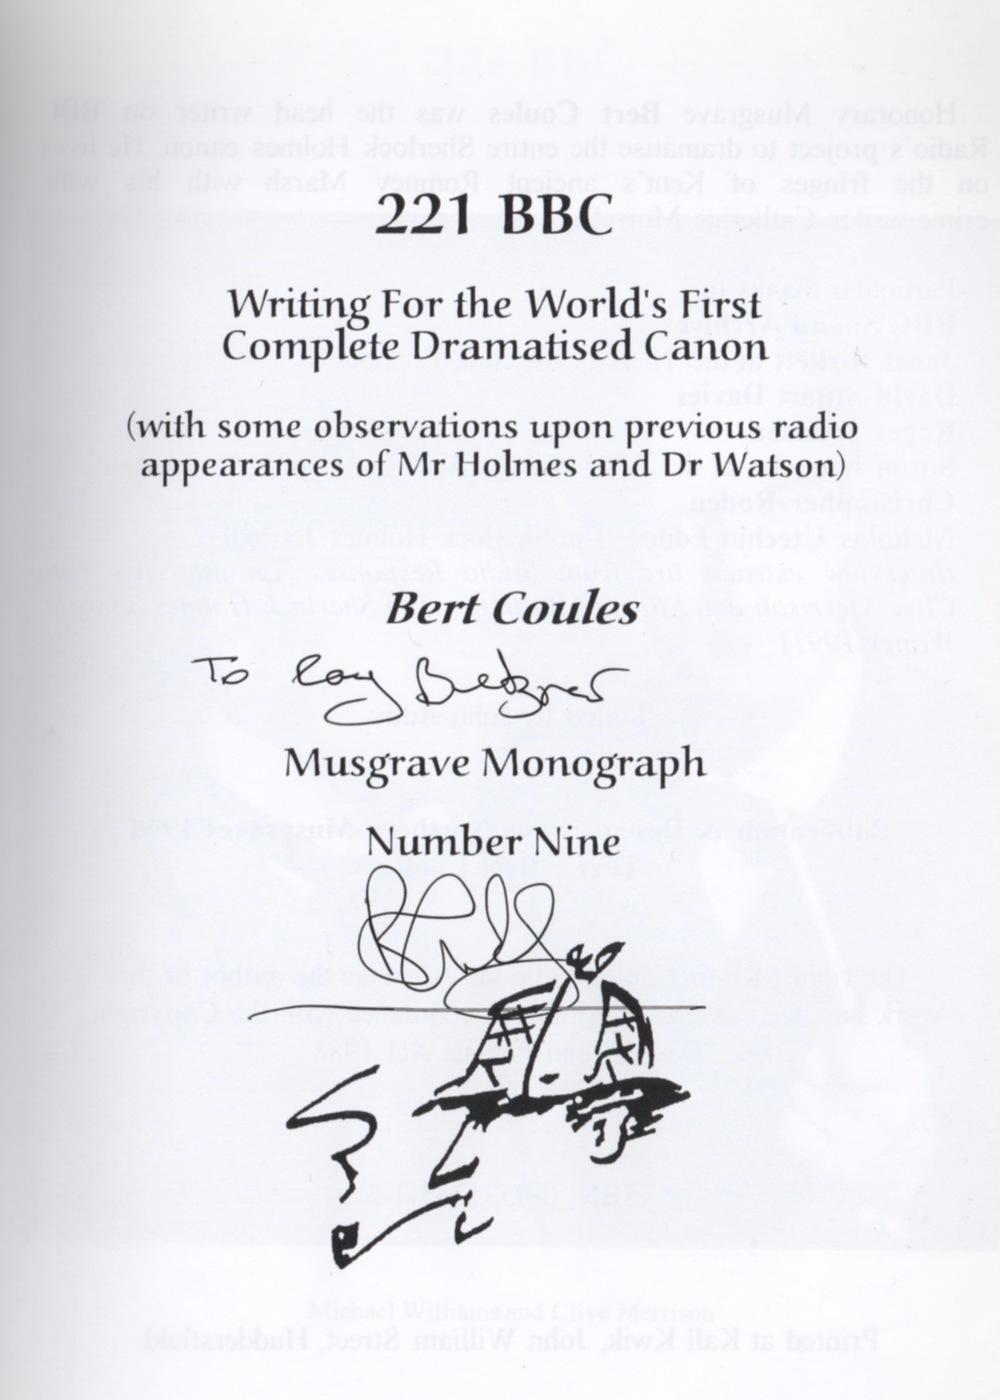 221 BBC title page.jpg